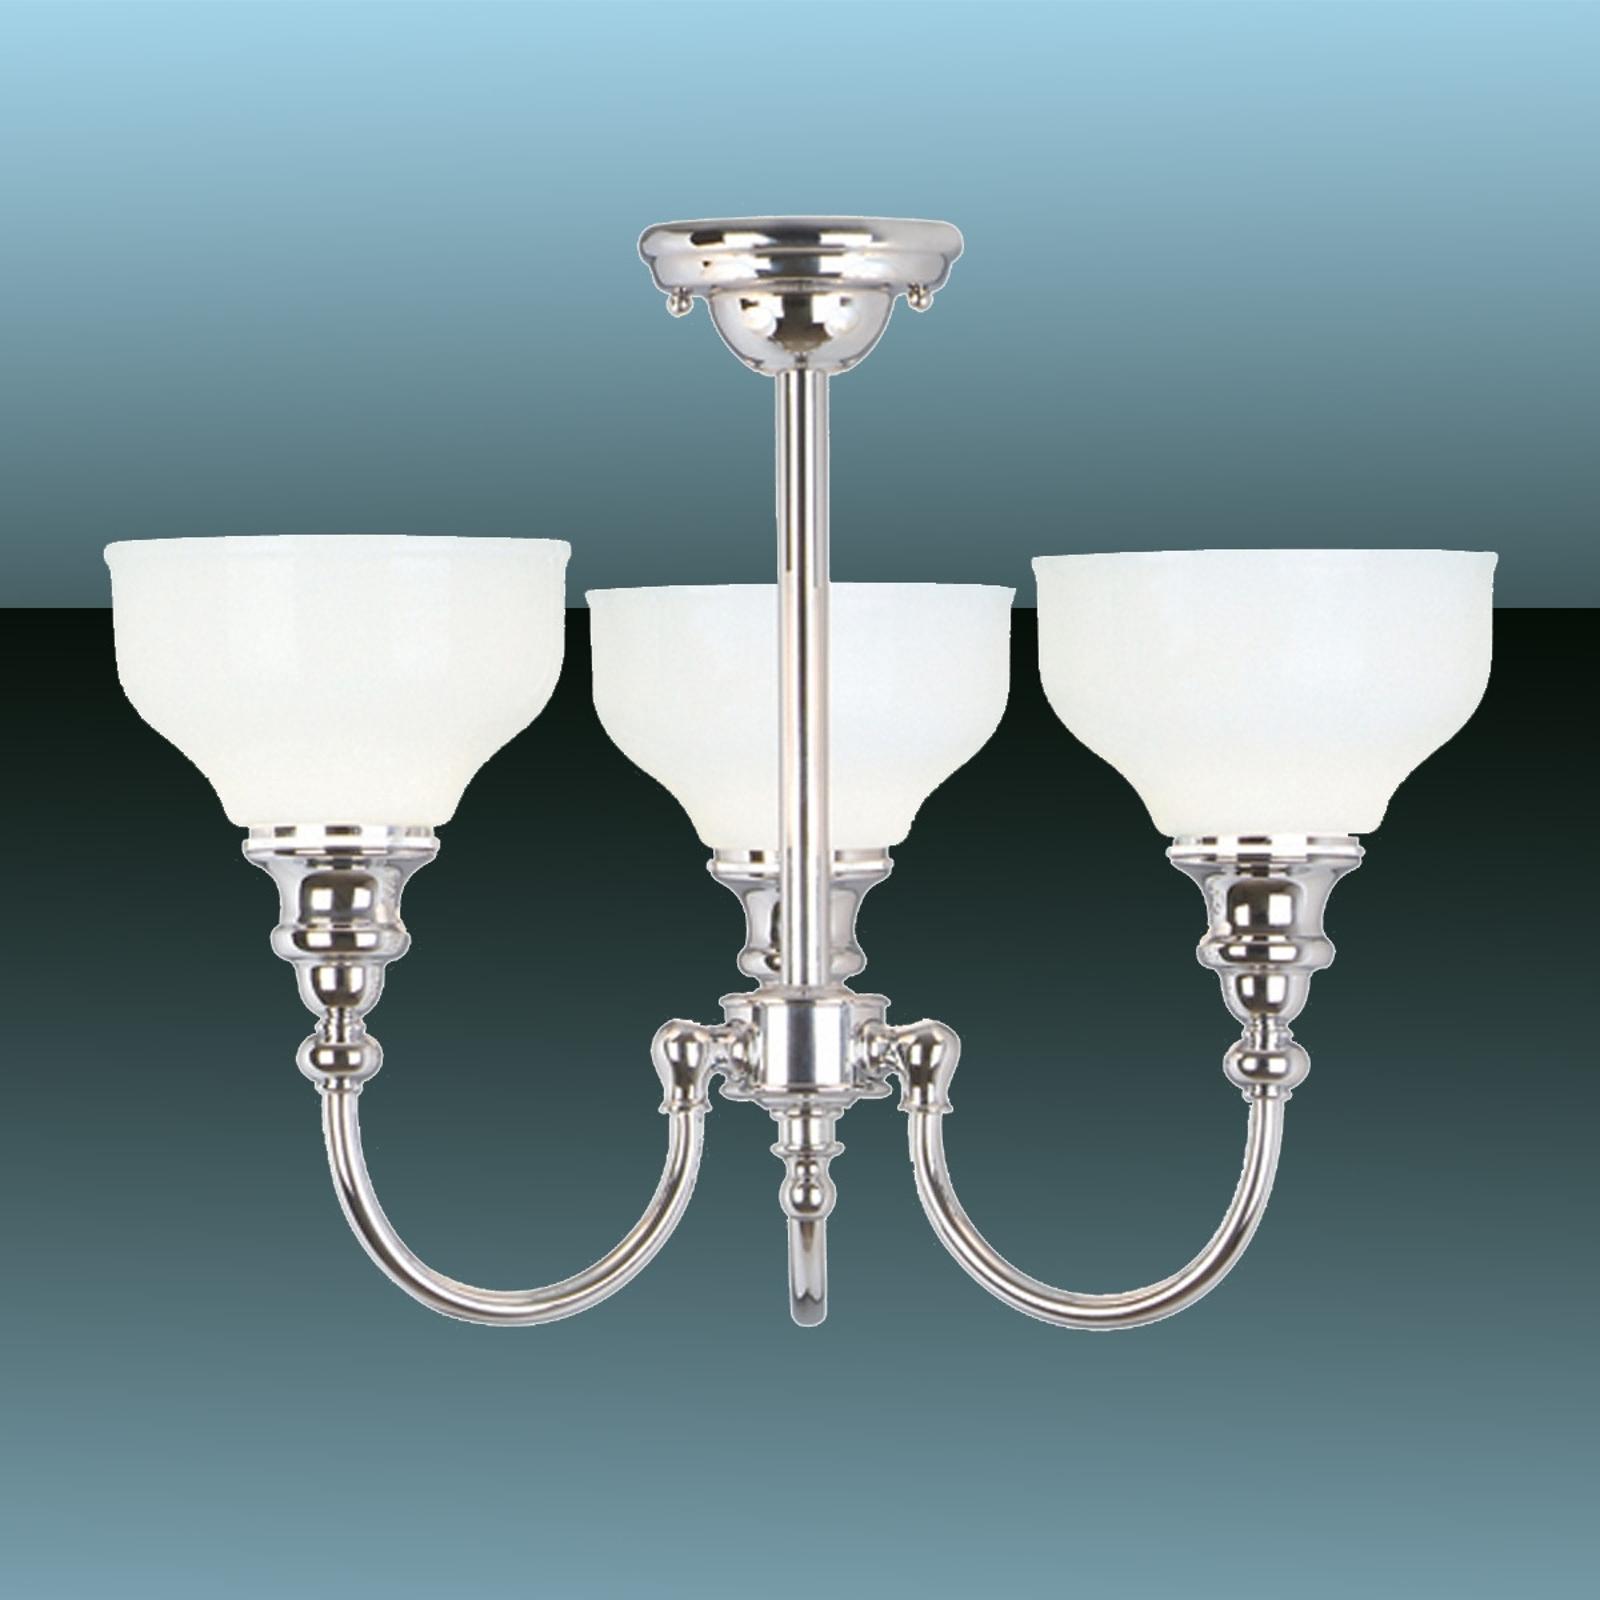 Badkamerplafondlamp Cheadle, 3-lichts